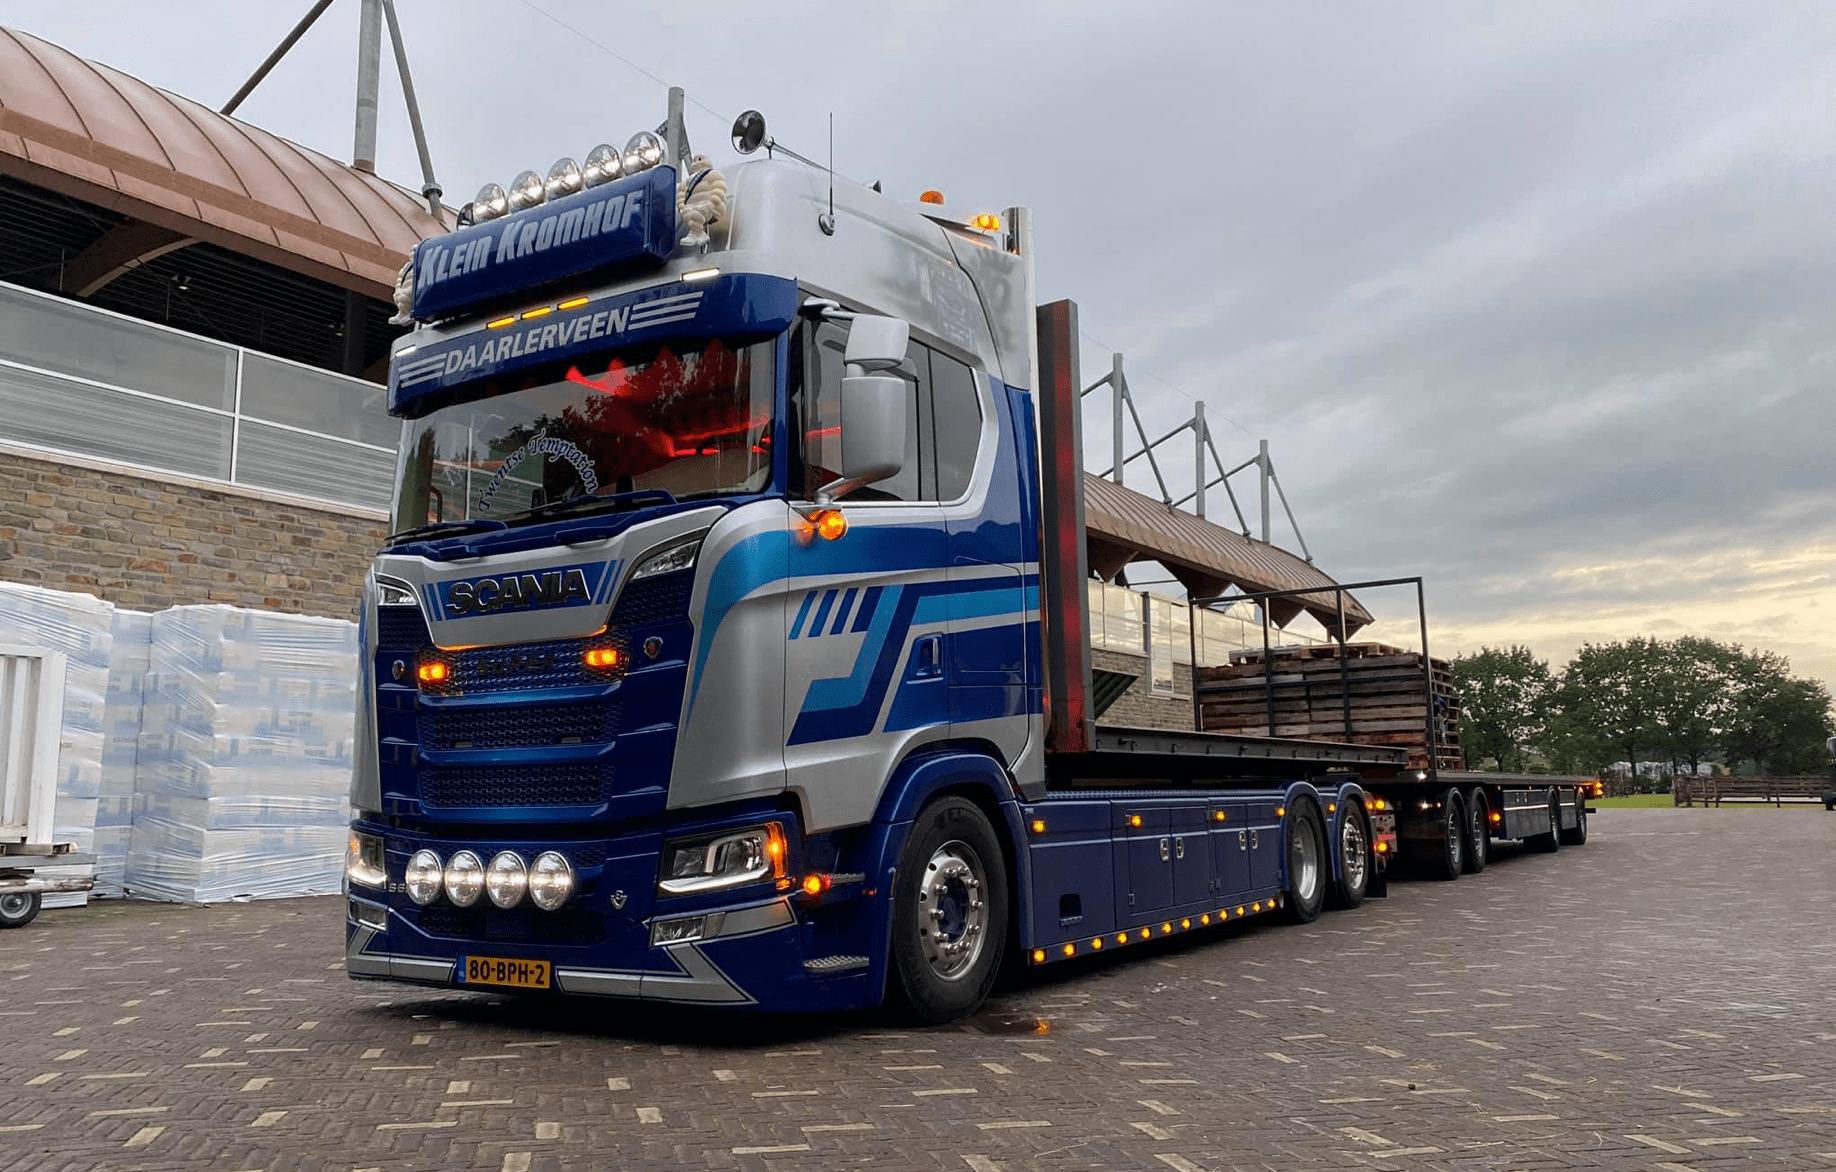 Klein_Kromhof_Truck_Tops_International_Arena